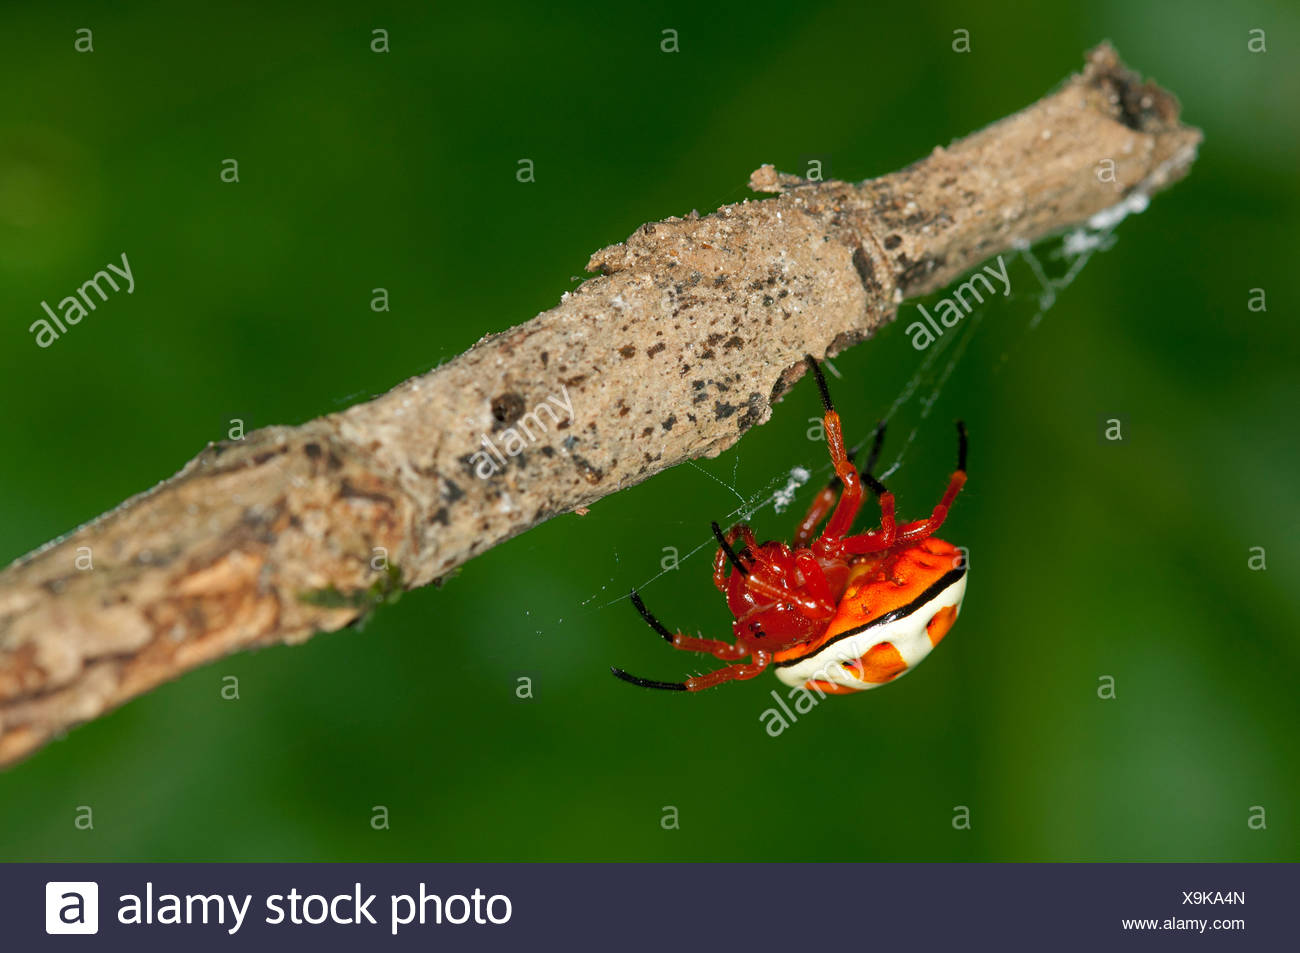 Bolas spider (Encyosaccus sexmaculatus), orb-web spider, Tiputini rain forest, Yasuni National Park, Ecuador, South America - Stock Image